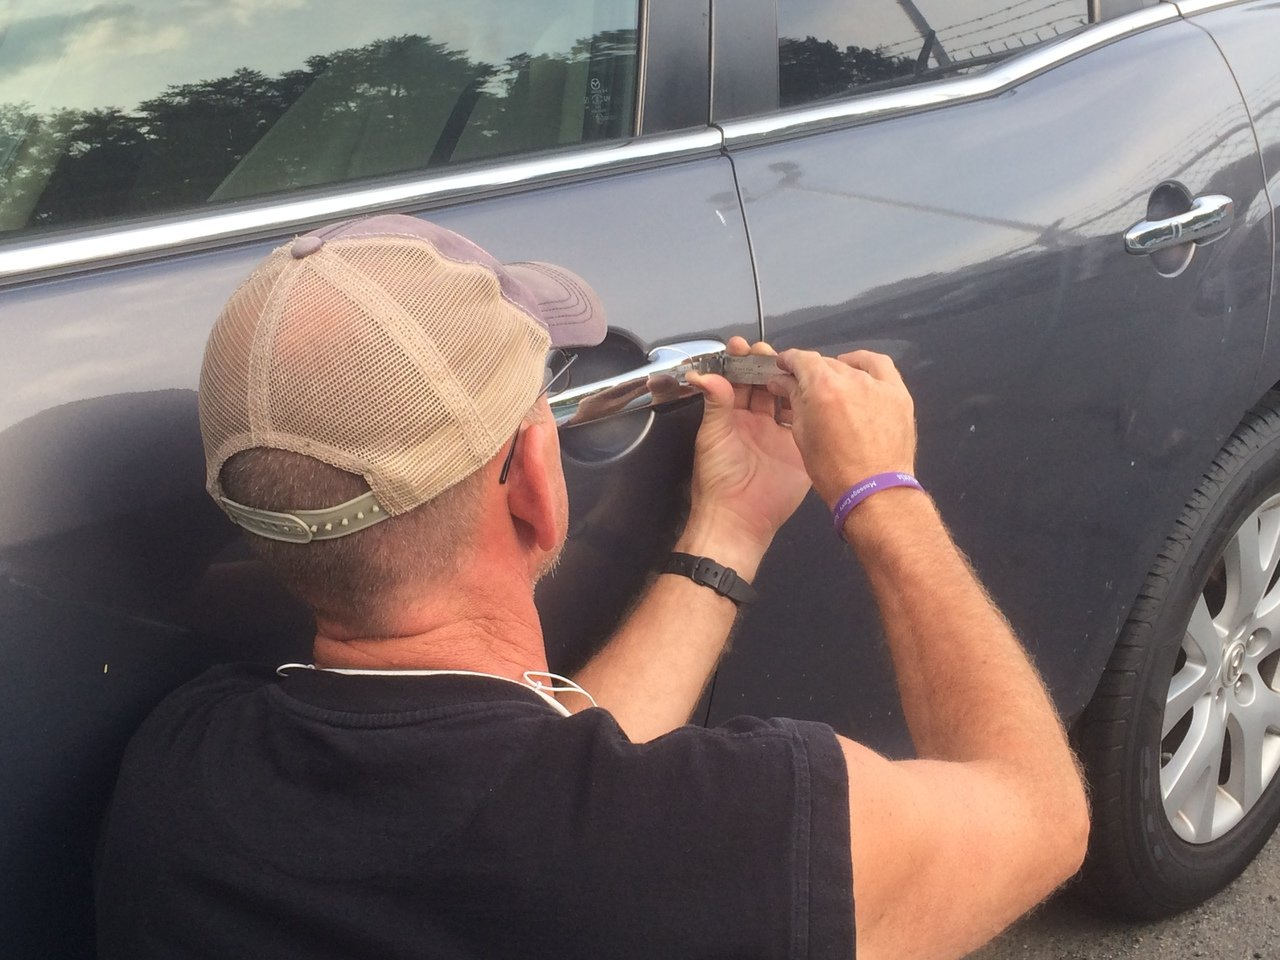 Locksmith in NC rekeying car door